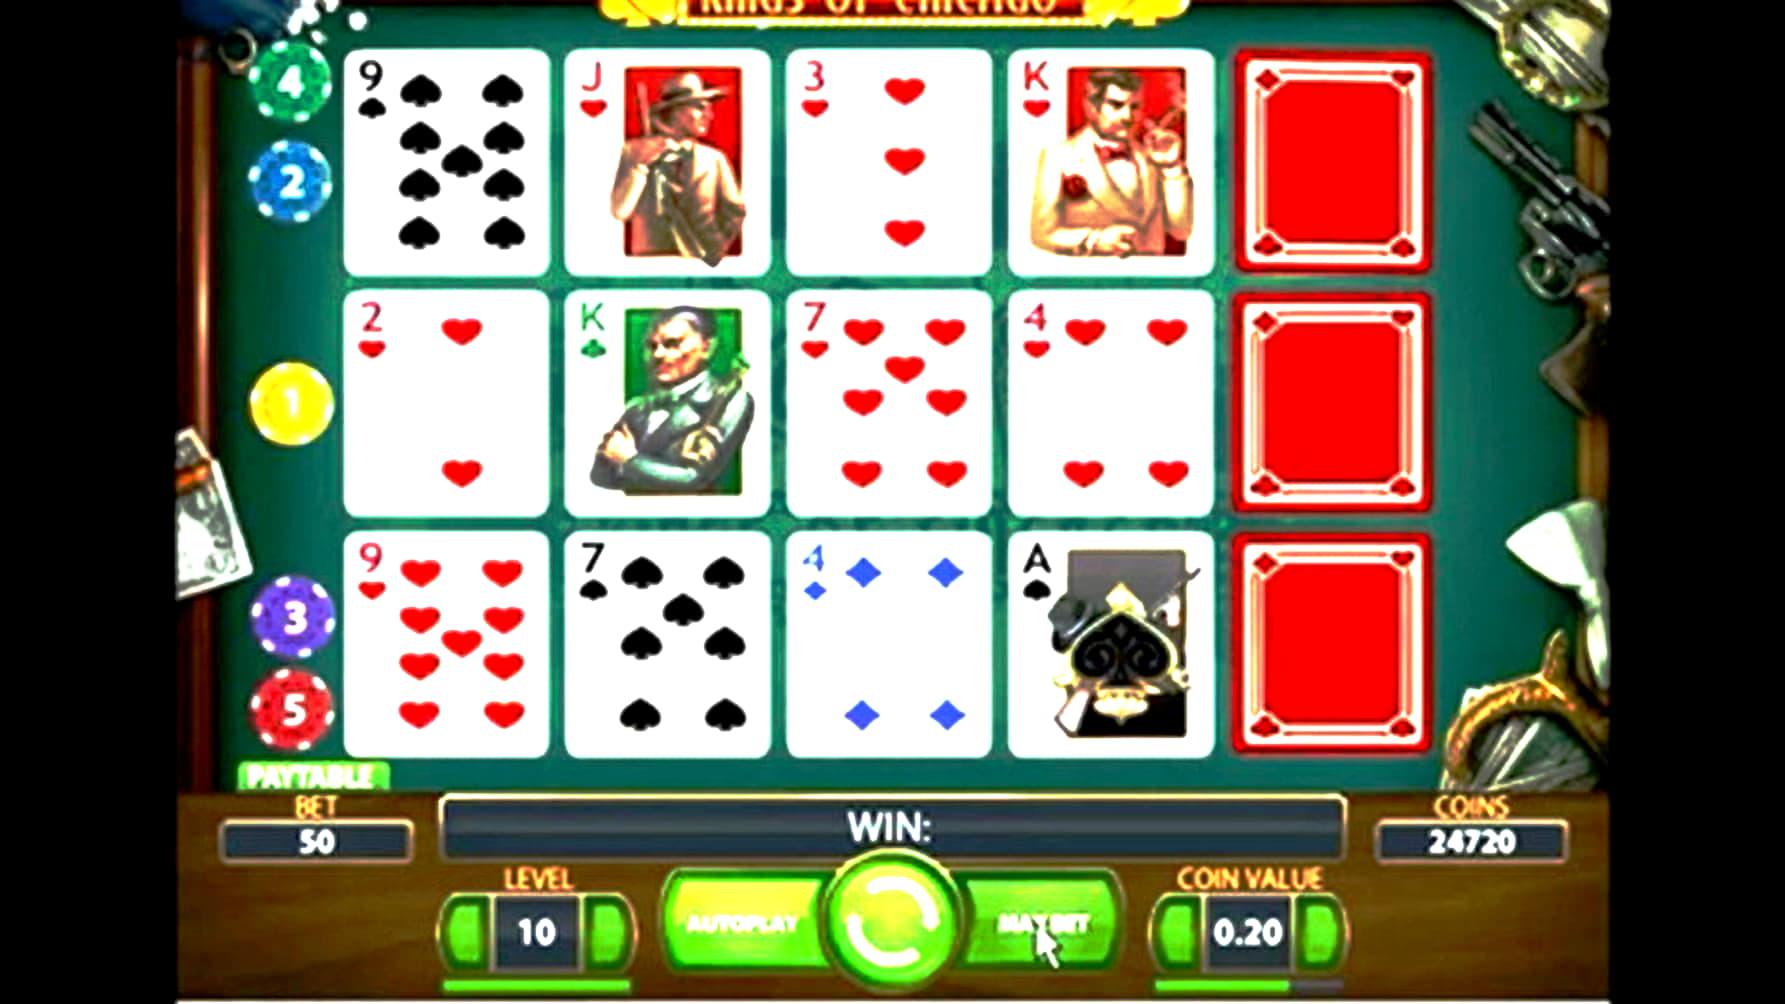 casinofreechips მაღალი როლიკებით